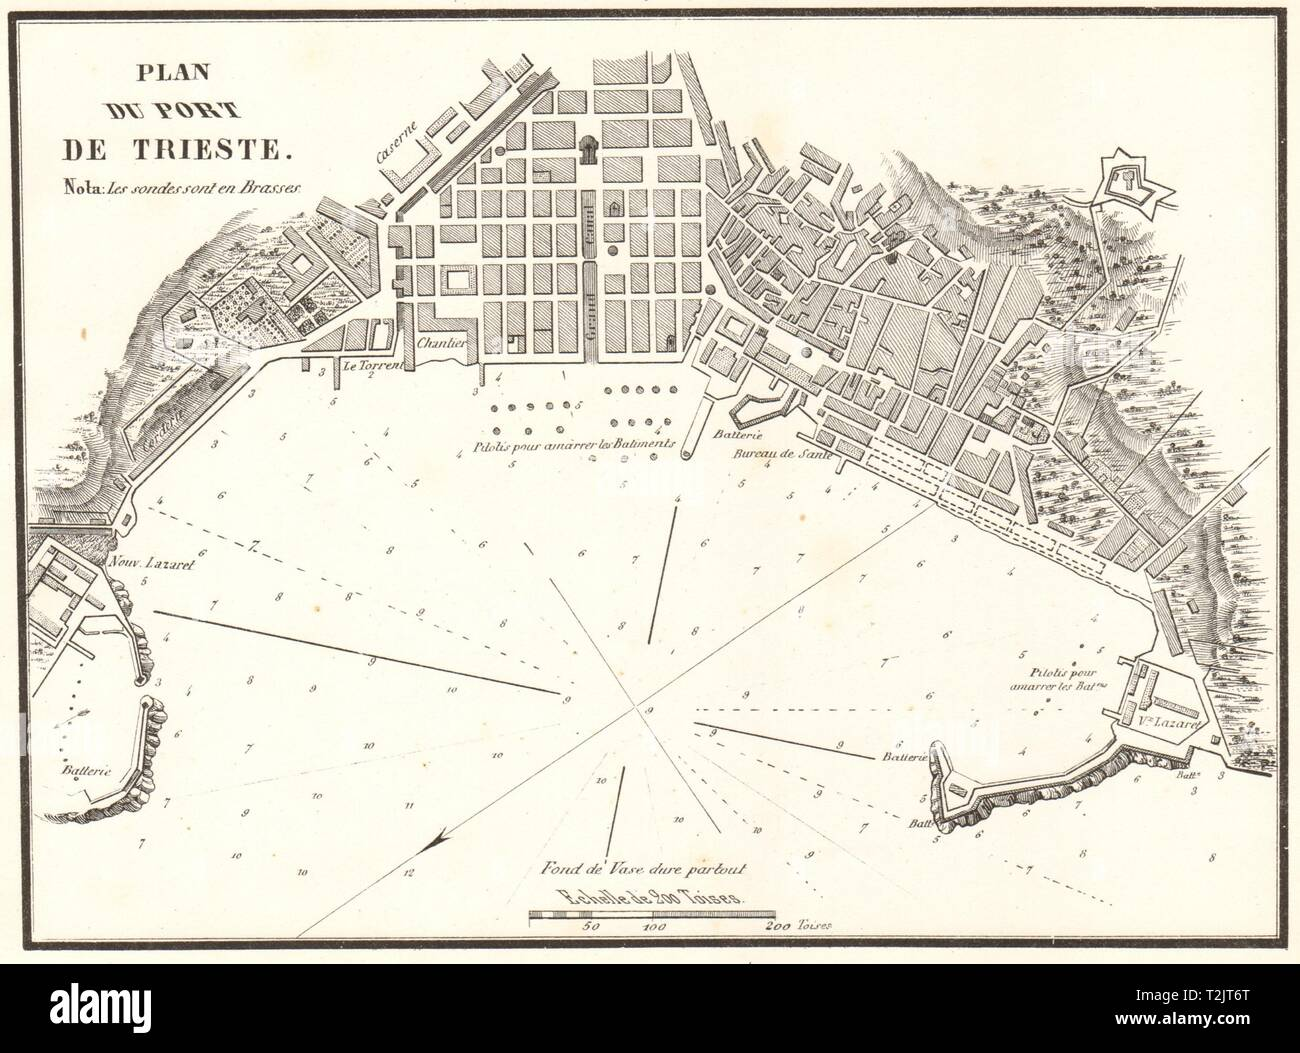 Plan of the Port of Trieste. 'Plan du Port de Trieste'. Italy. GAUTTIER 1854 map - Stock Image